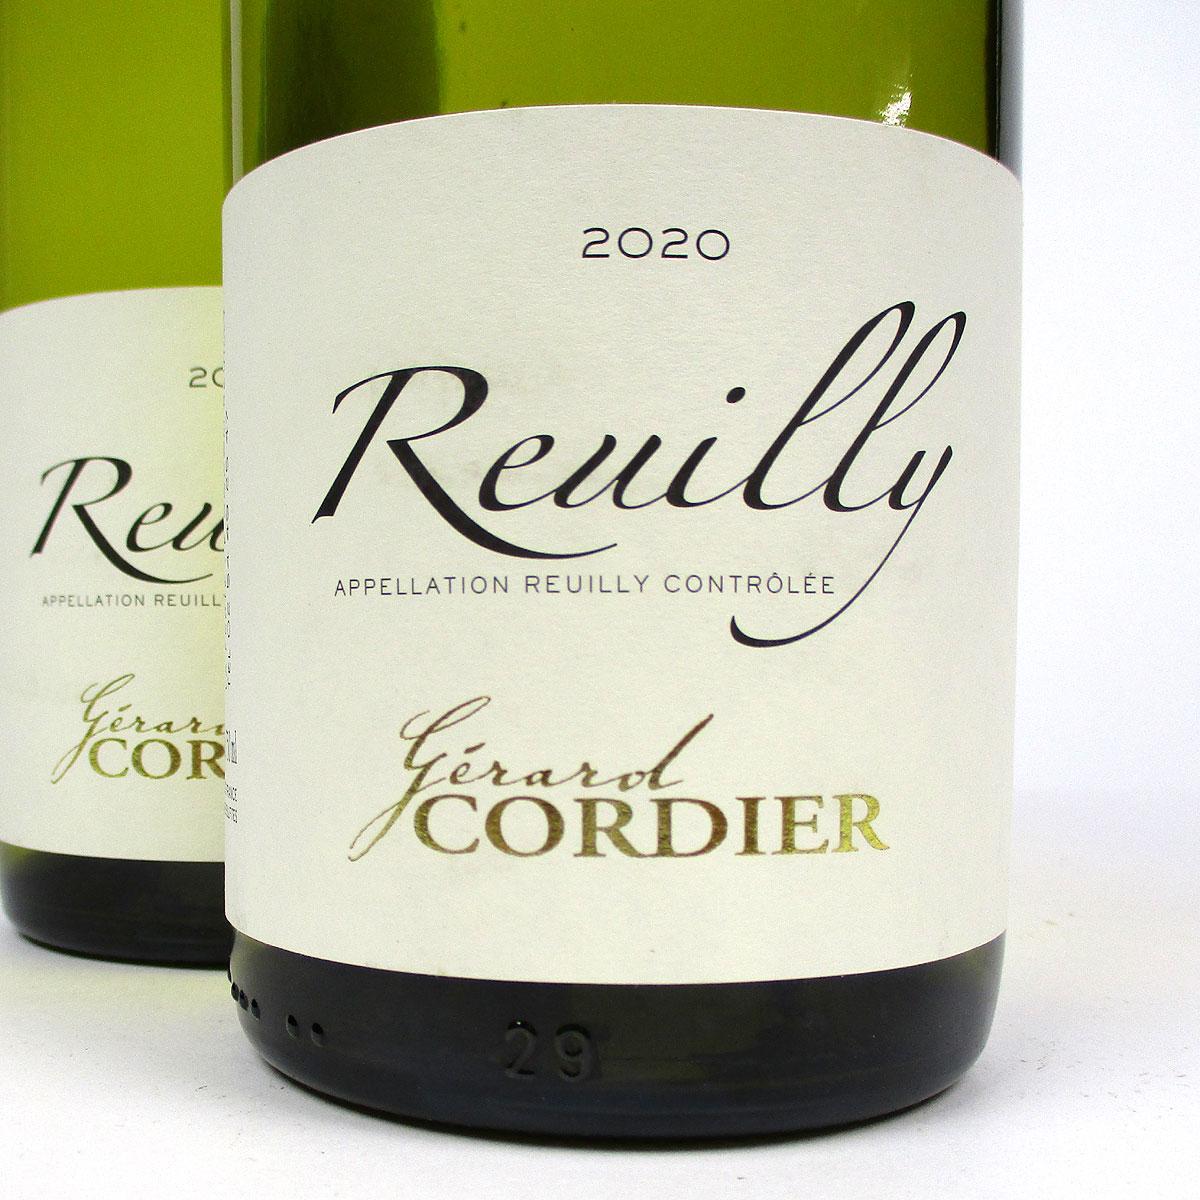 Reuilly: Gerard Cordier Blanc 2020